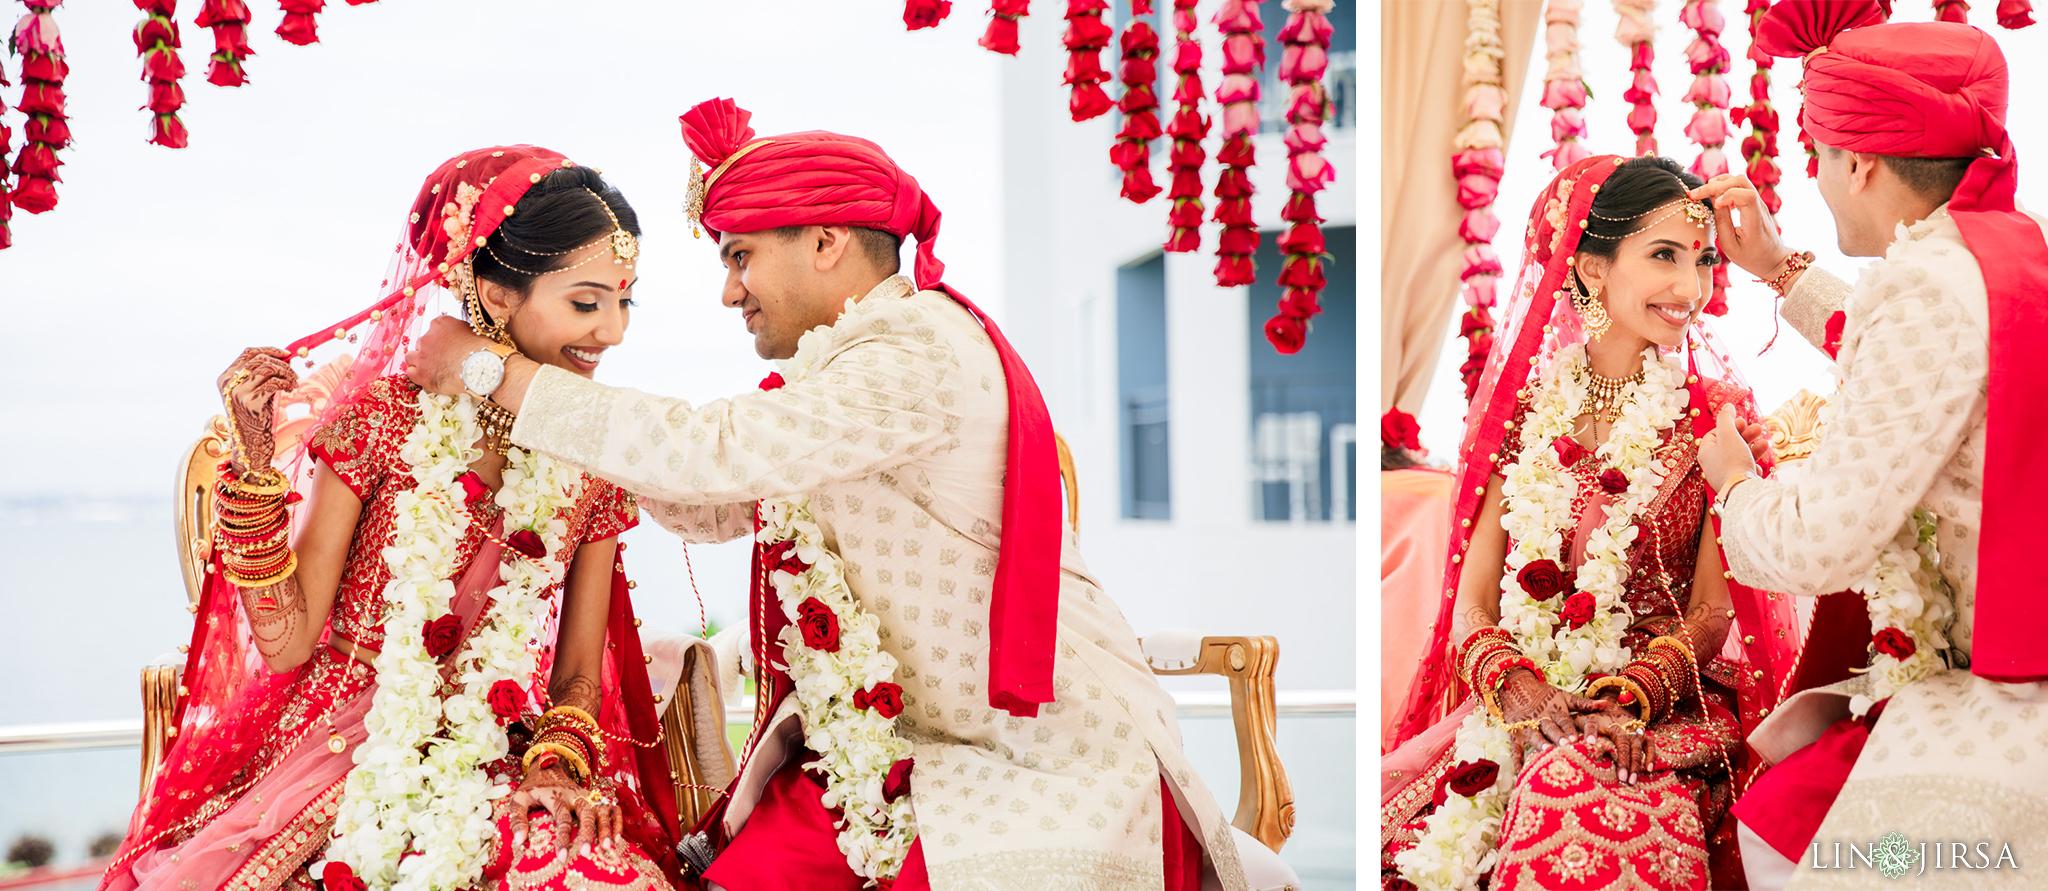 27 Loews Coronado Bay Resort San Diego Indian Wedding Photography